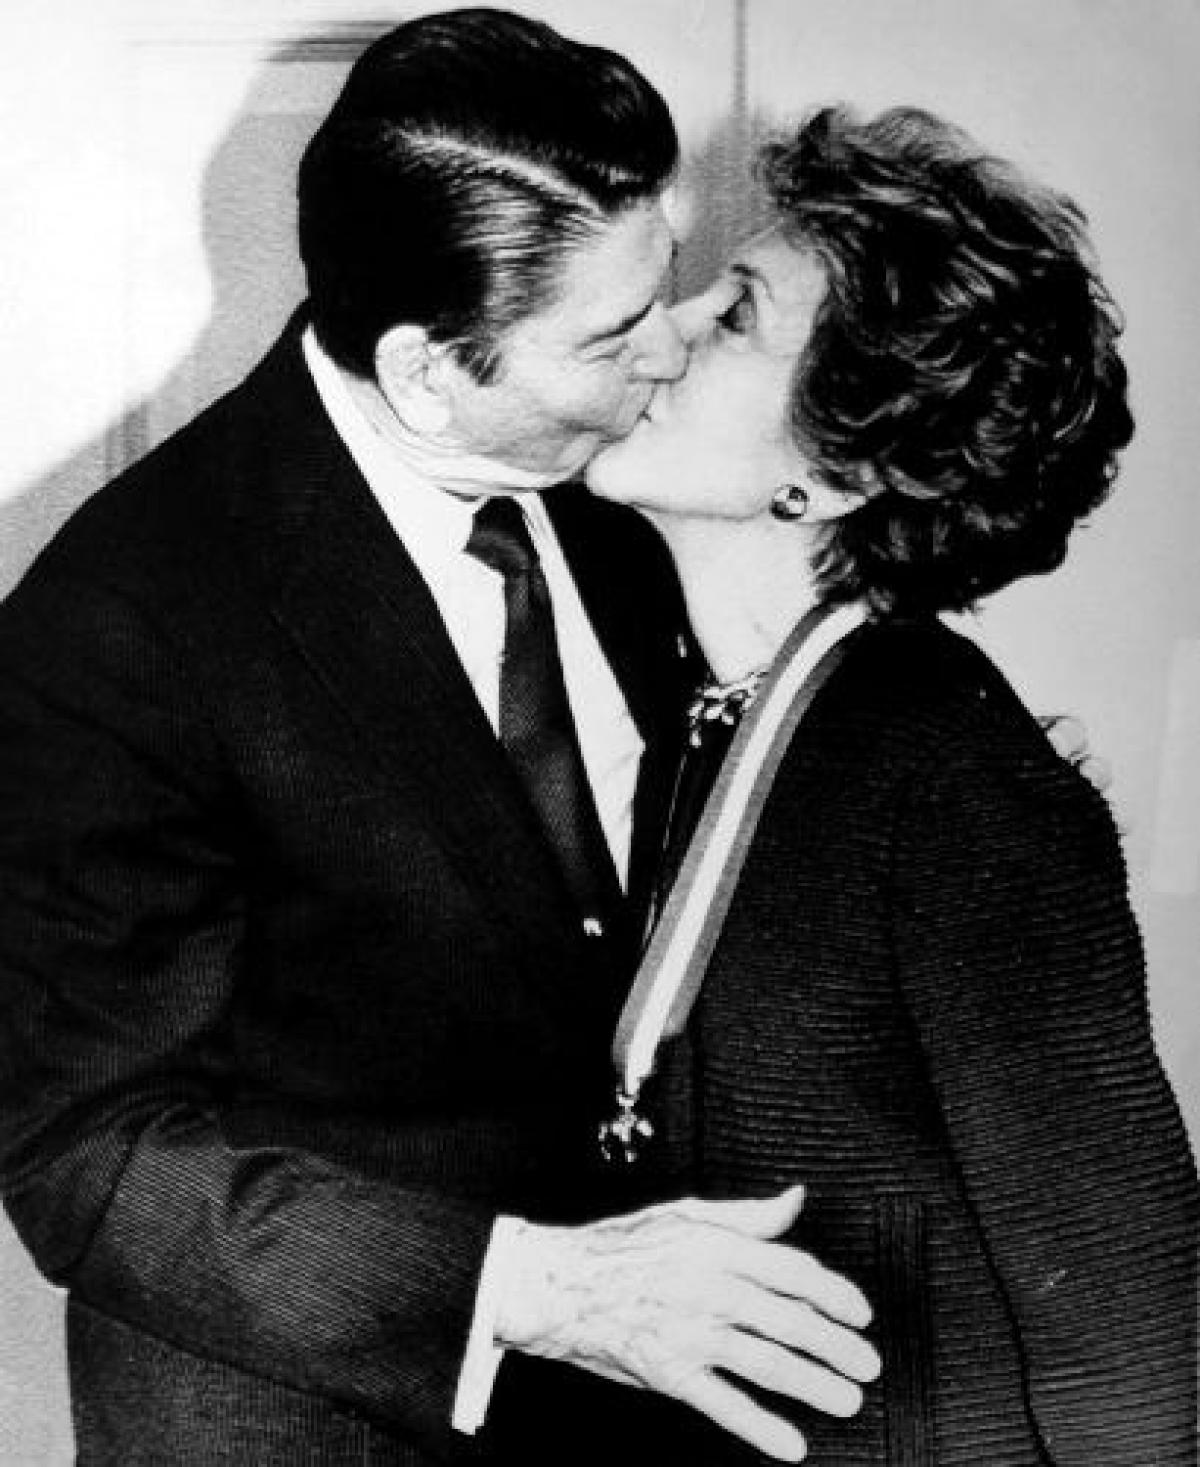 gal-politicians-kissing6-jpg